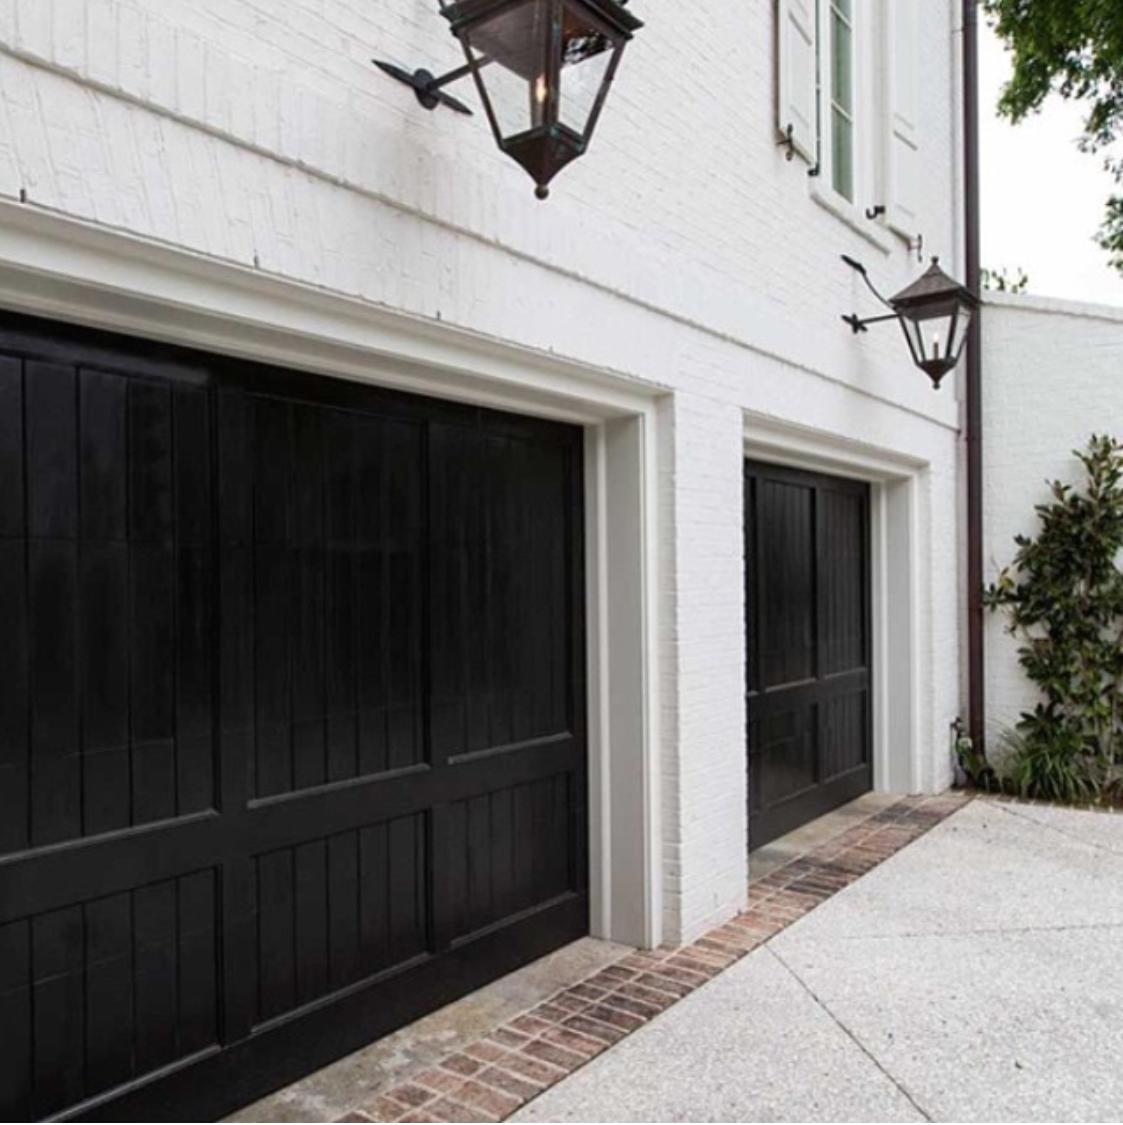 Grey house black garage doors - Black Garage Doors Monochrome Traditional